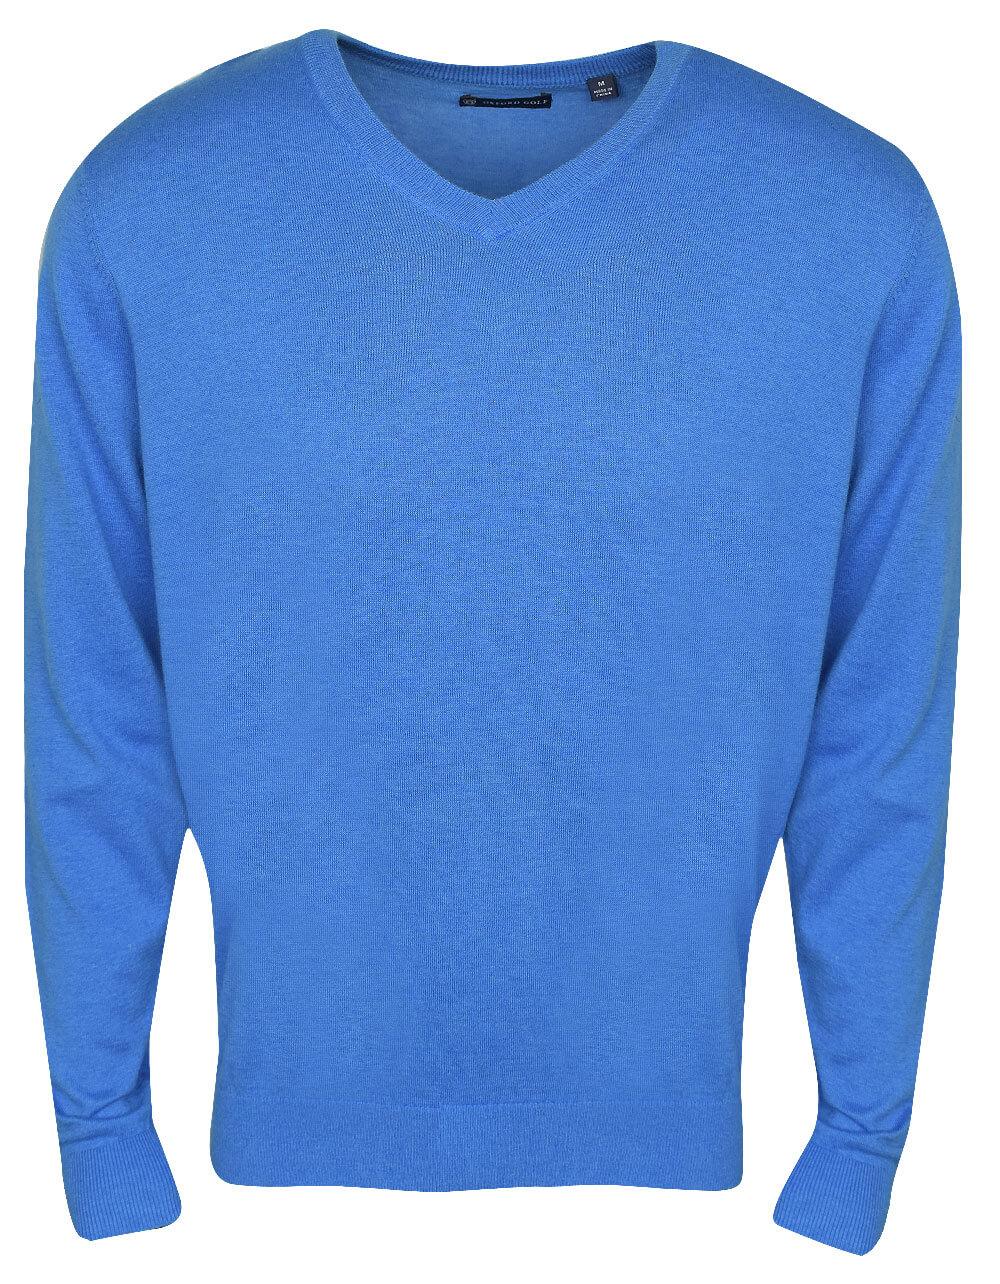 Callaway Golf 14 Zip Easy Care Merino Wool Sweater Rockbottomgolfcom